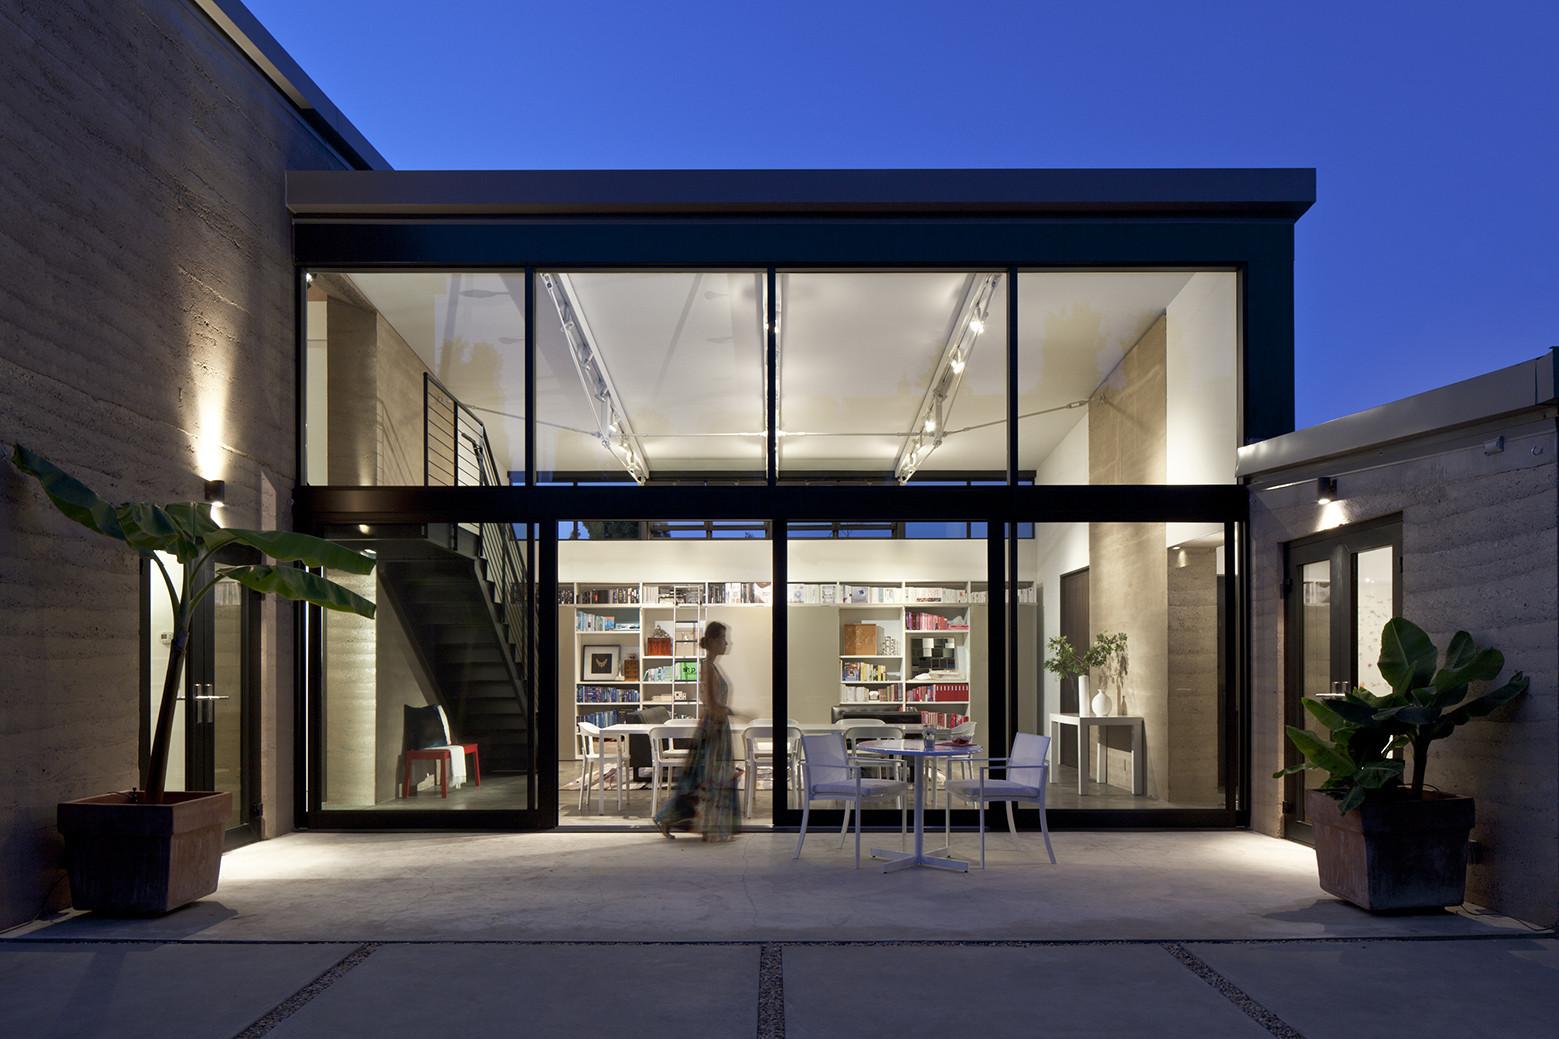 Casa En Mountain View Atelier Hsu Plataforma Arquitectura